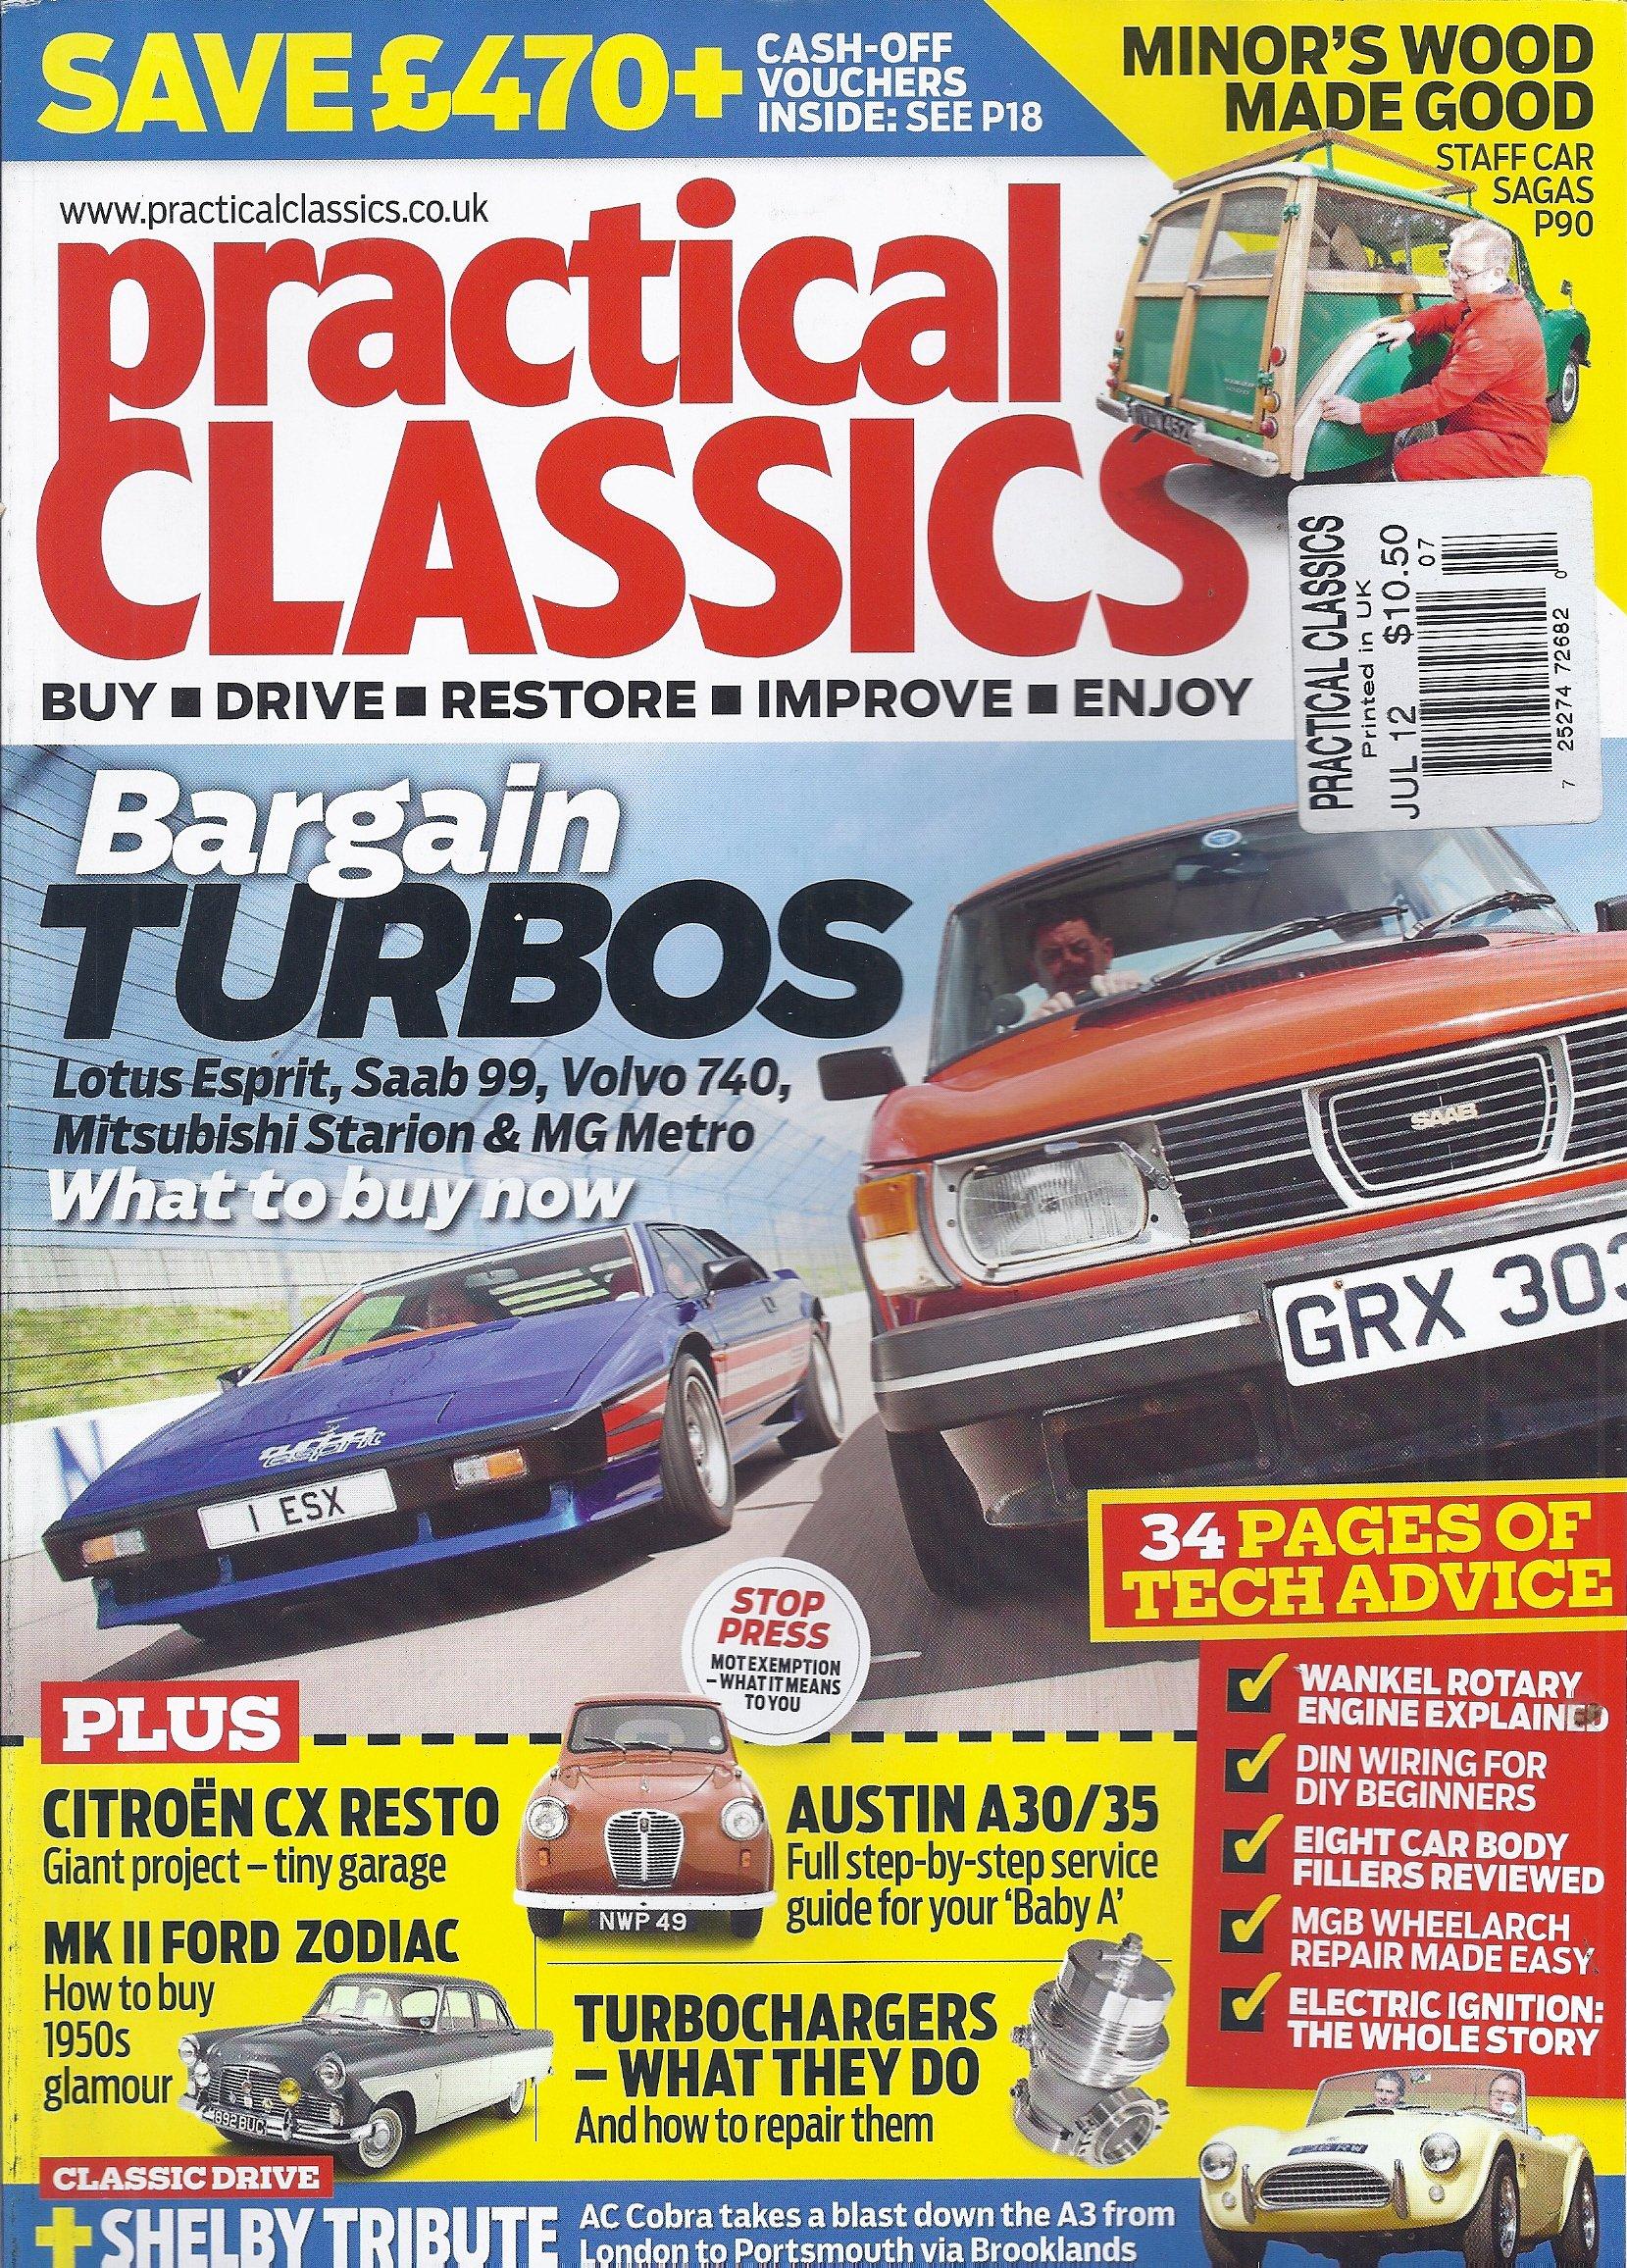 Practical Classics (July 2012,Bargain Turbos) Single Issue Magazine – 2012